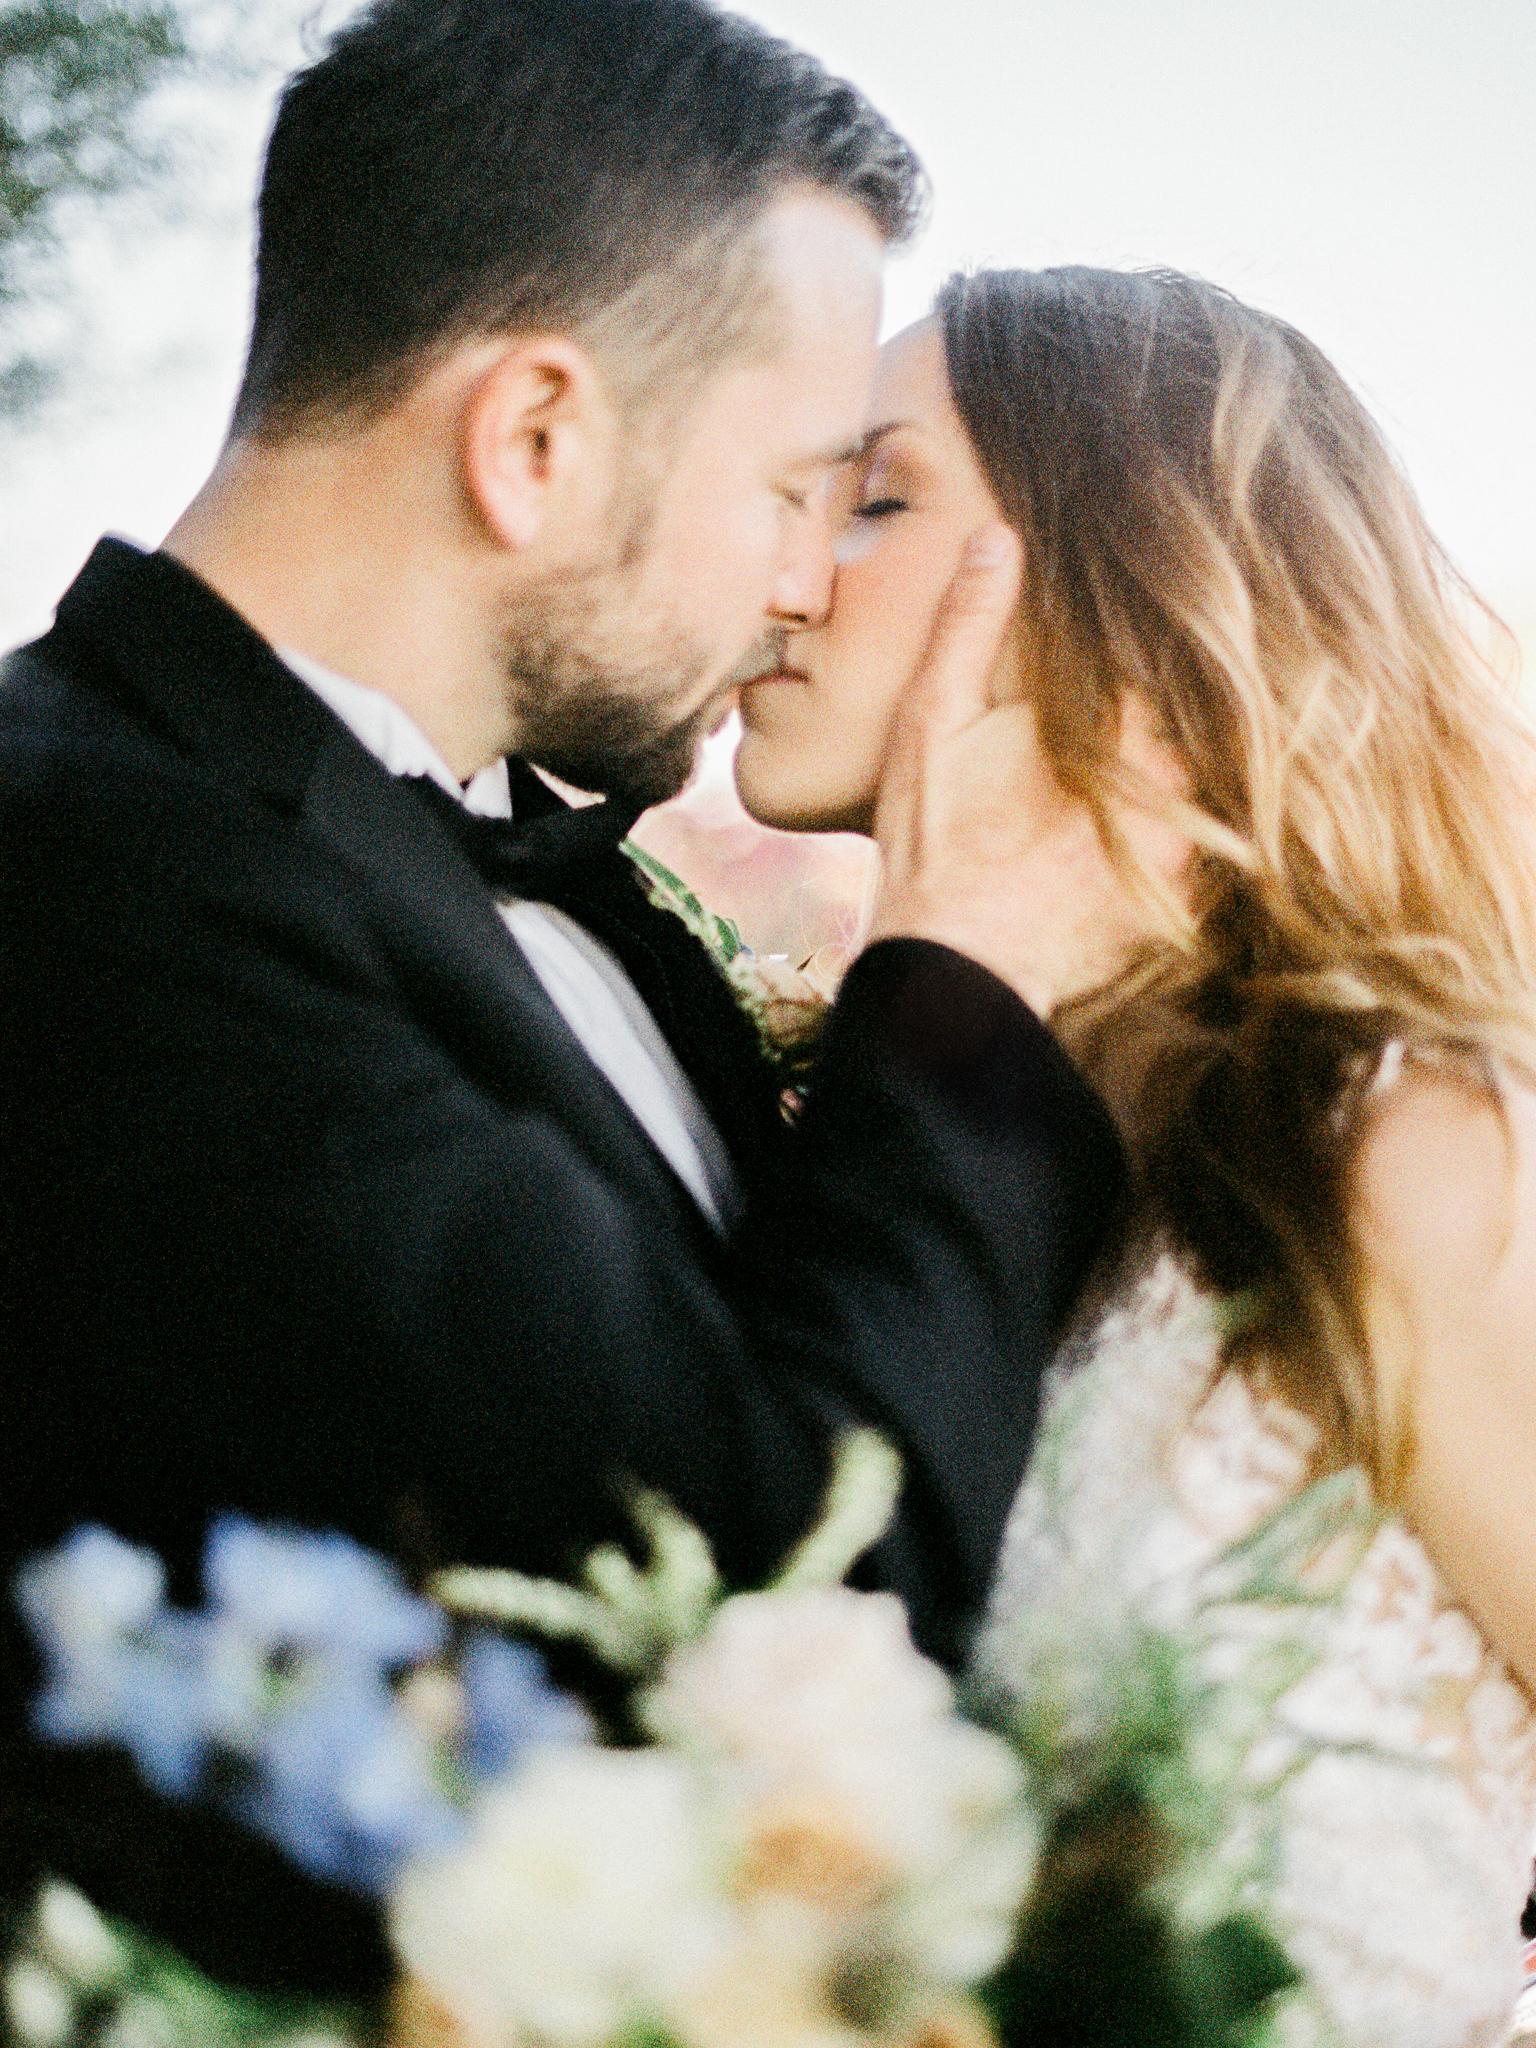 christinadavis+weddinginspiration35.jpg